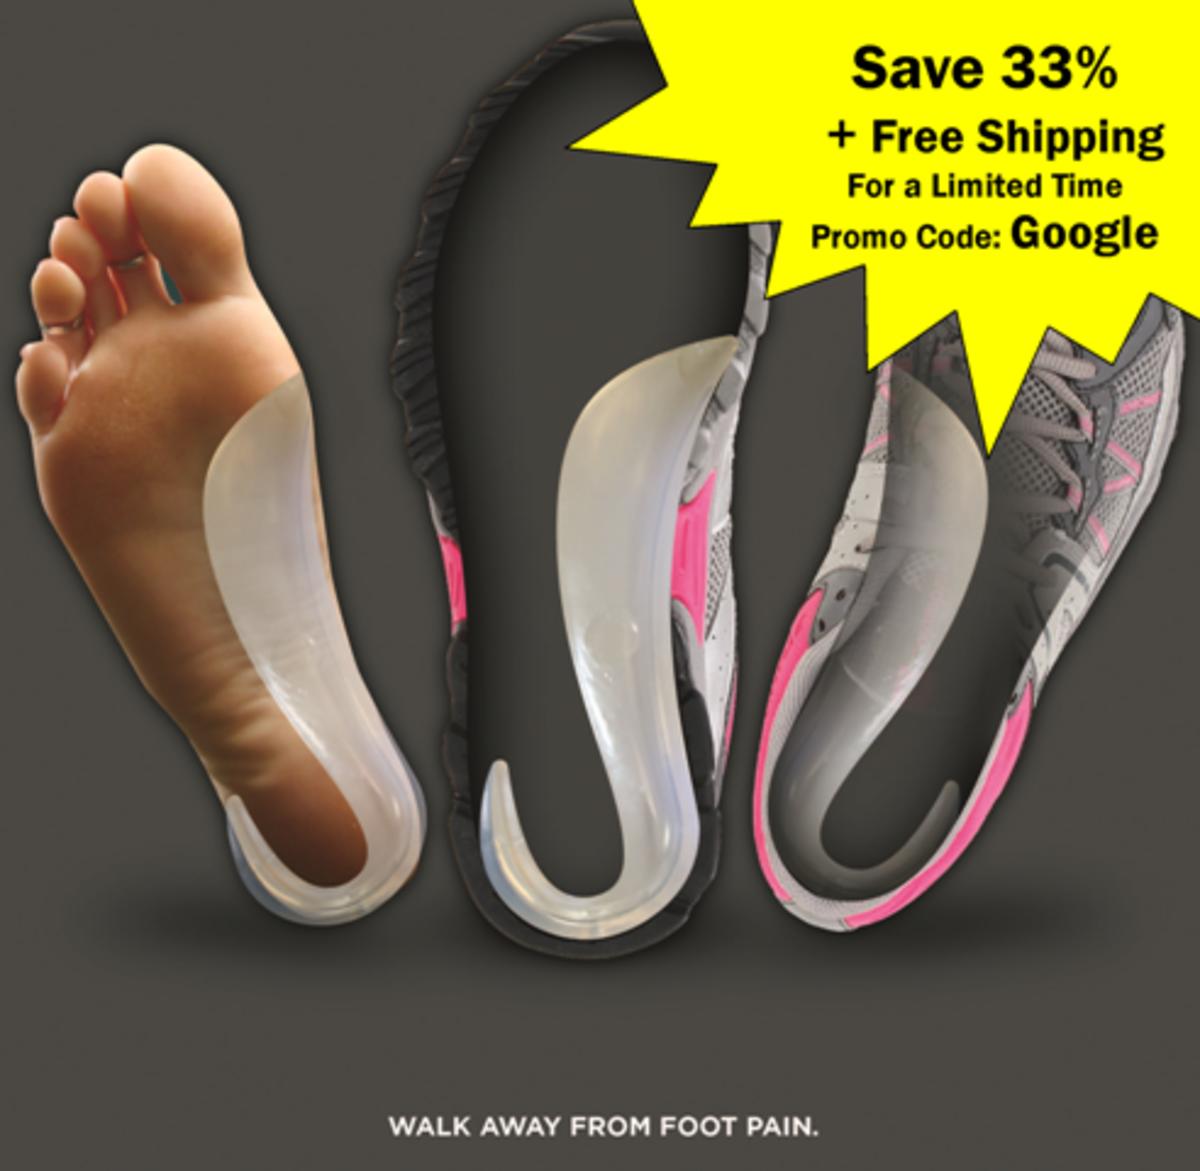 Foot_Pain_Diagnosis_-_Plantar_Fasciitis_Symptoms_-_Heel_Pain_Causes